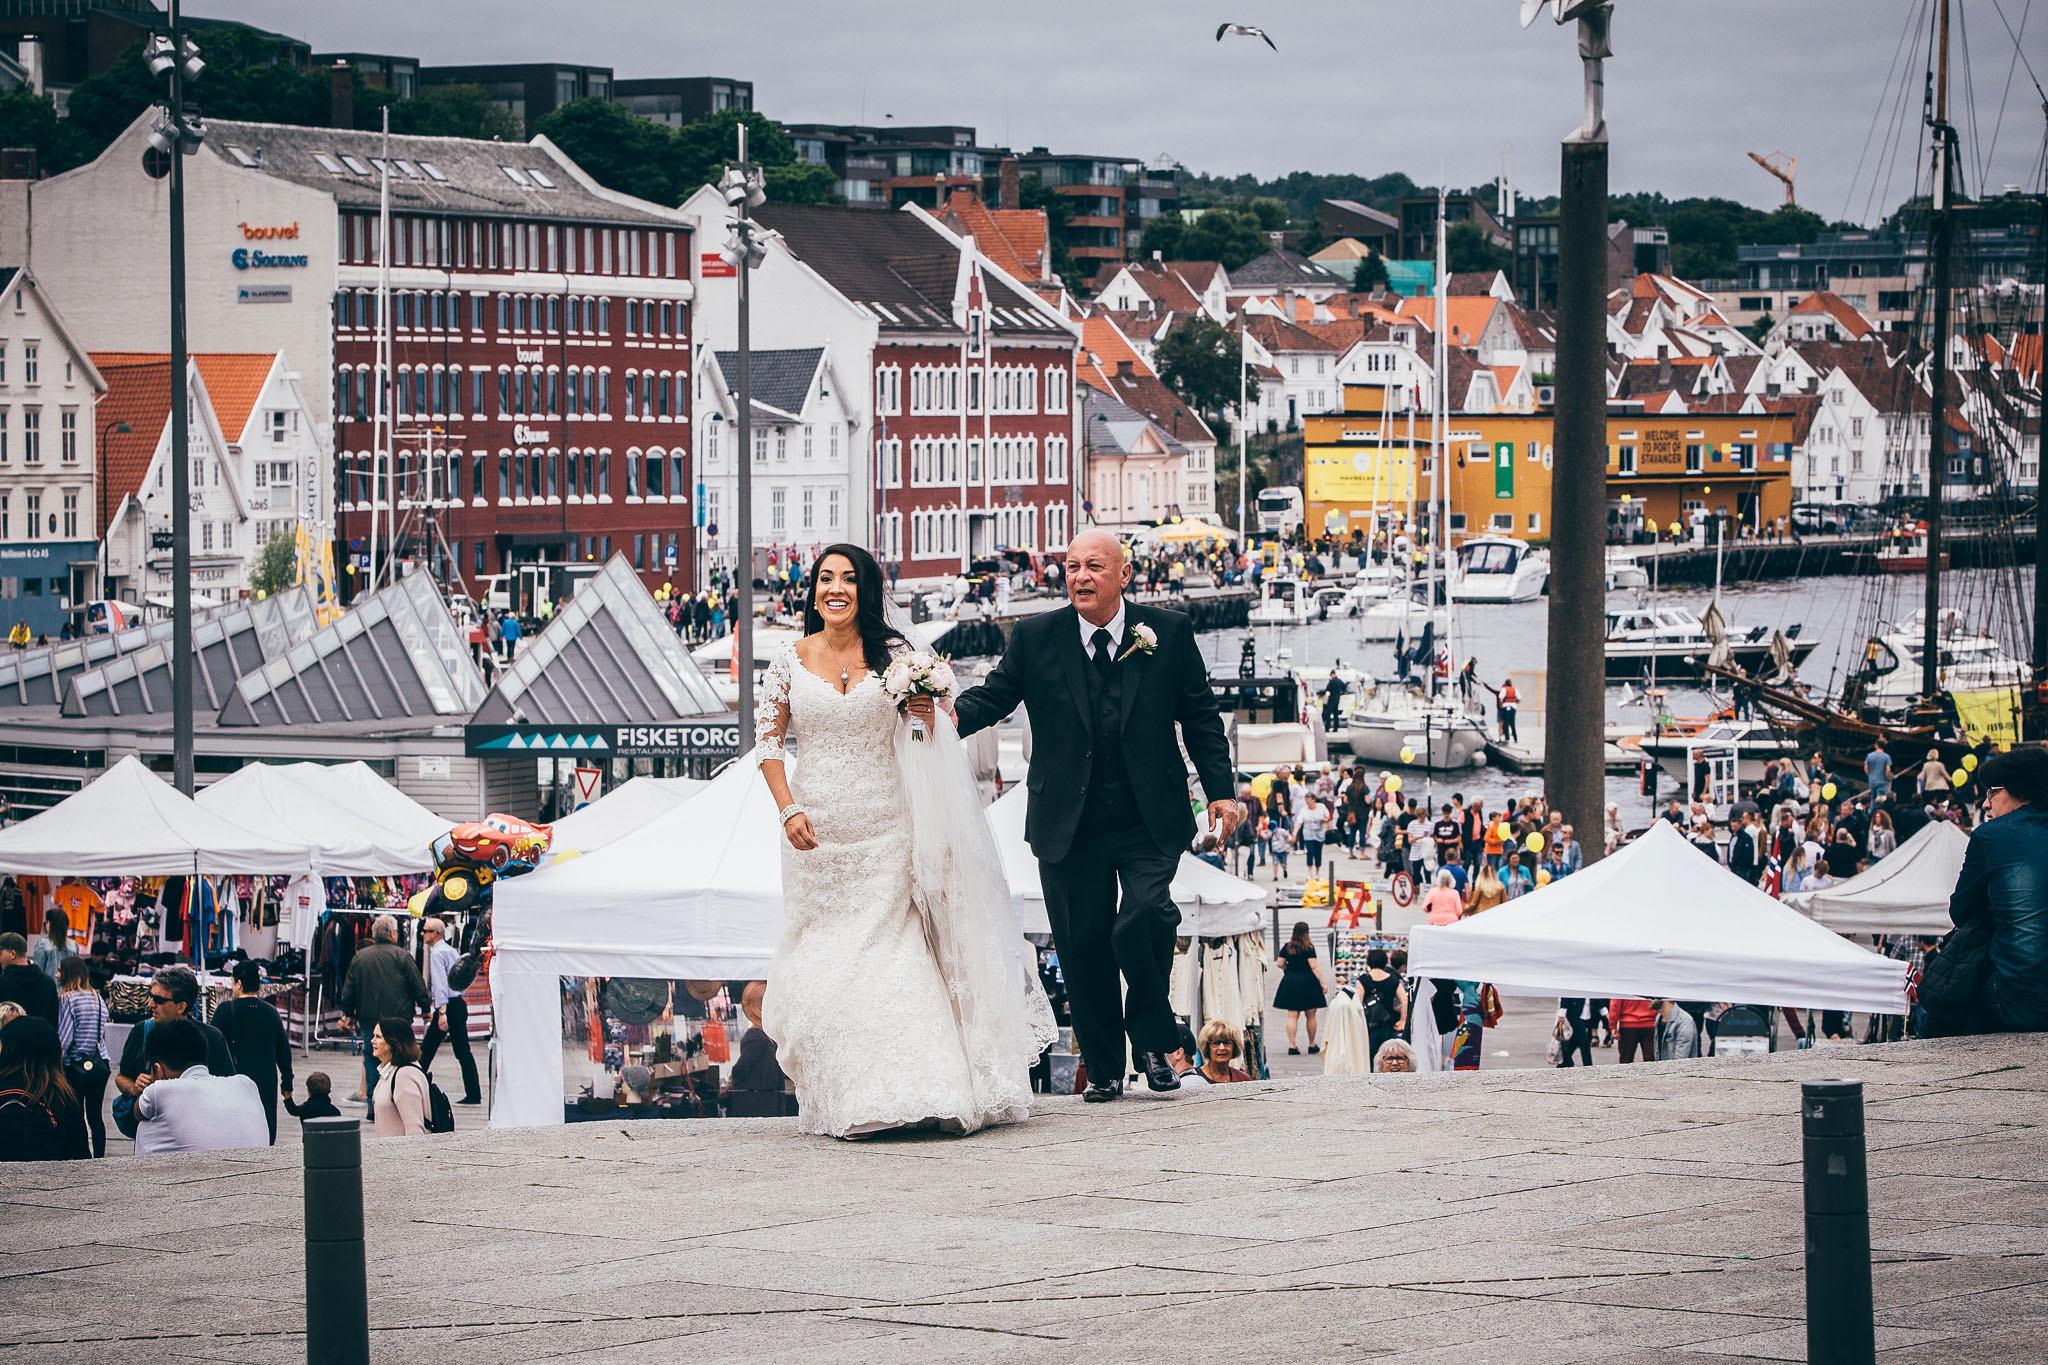 Wedding+Photographer+Norway+Bryllupsfotograf+Casey+Arneson+MK-116.jpg